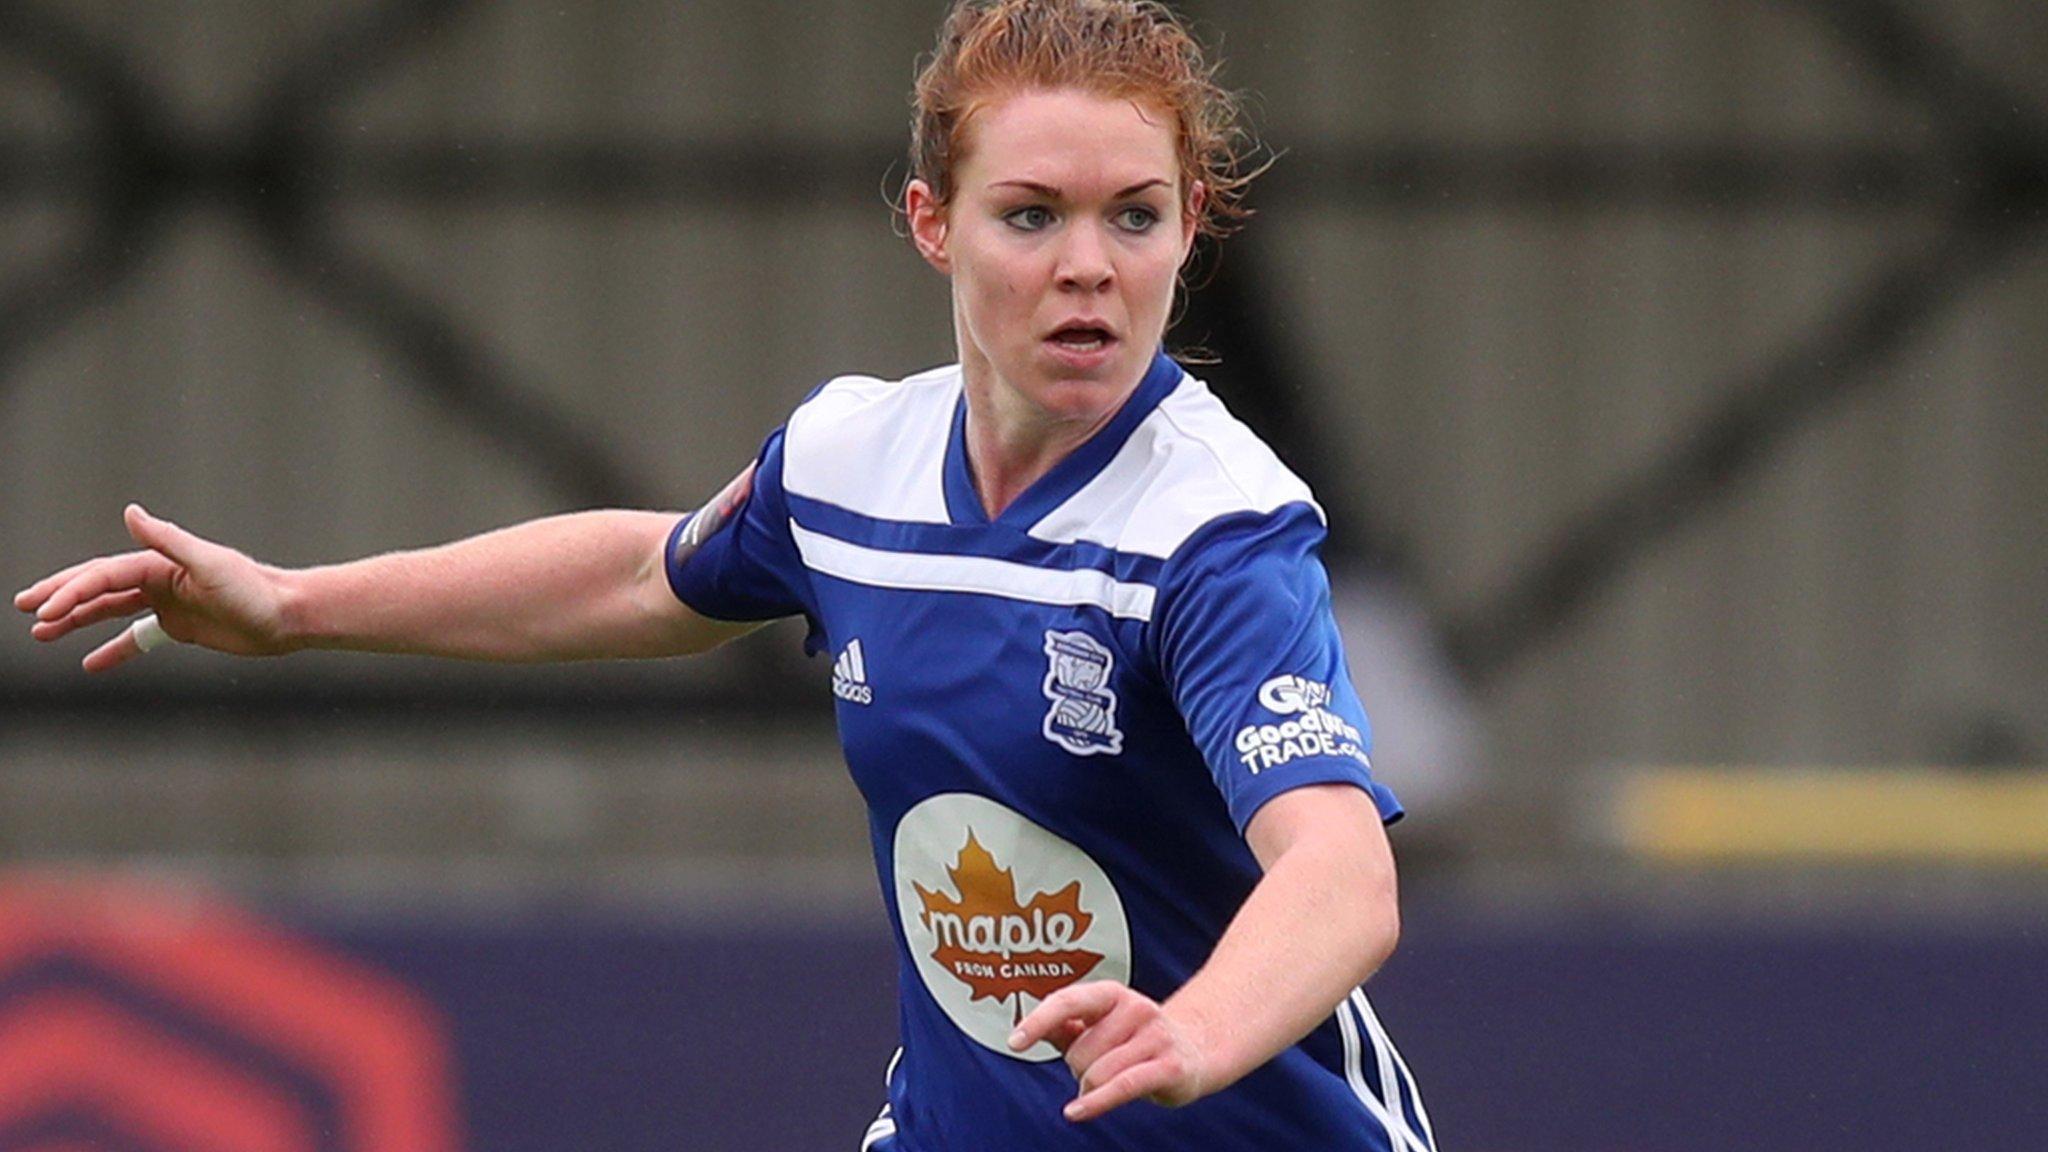 Birmingham City Women 1-0 Brighton & Hove Albion Women